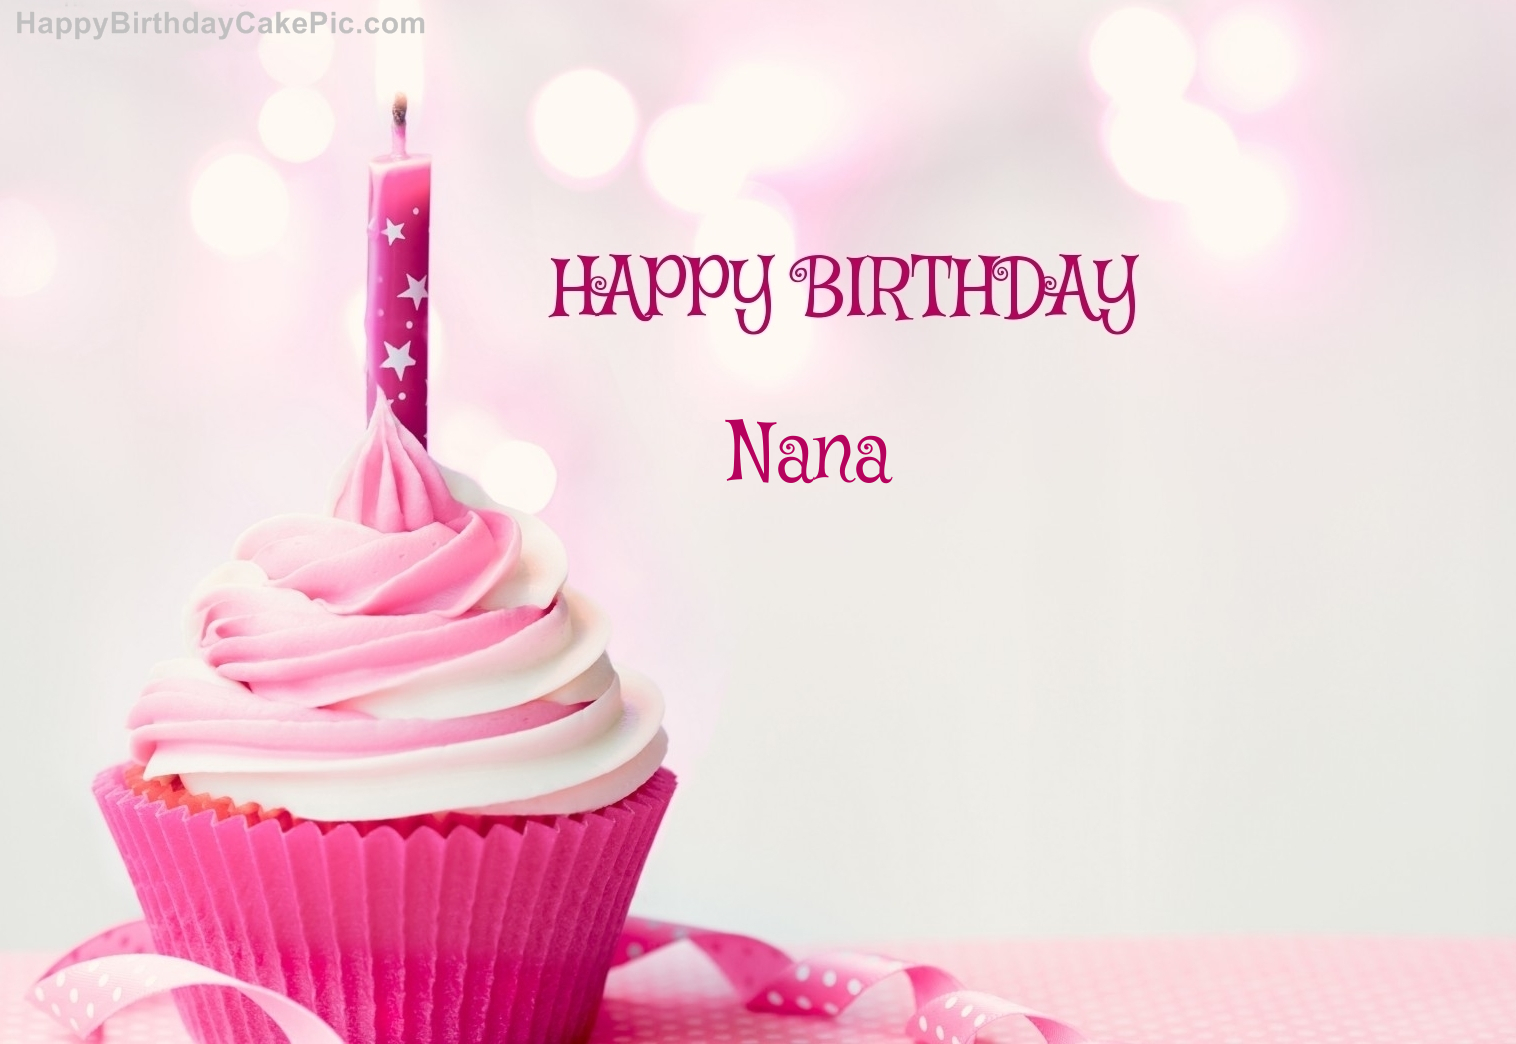 Happy Birthday Nana Cake Images